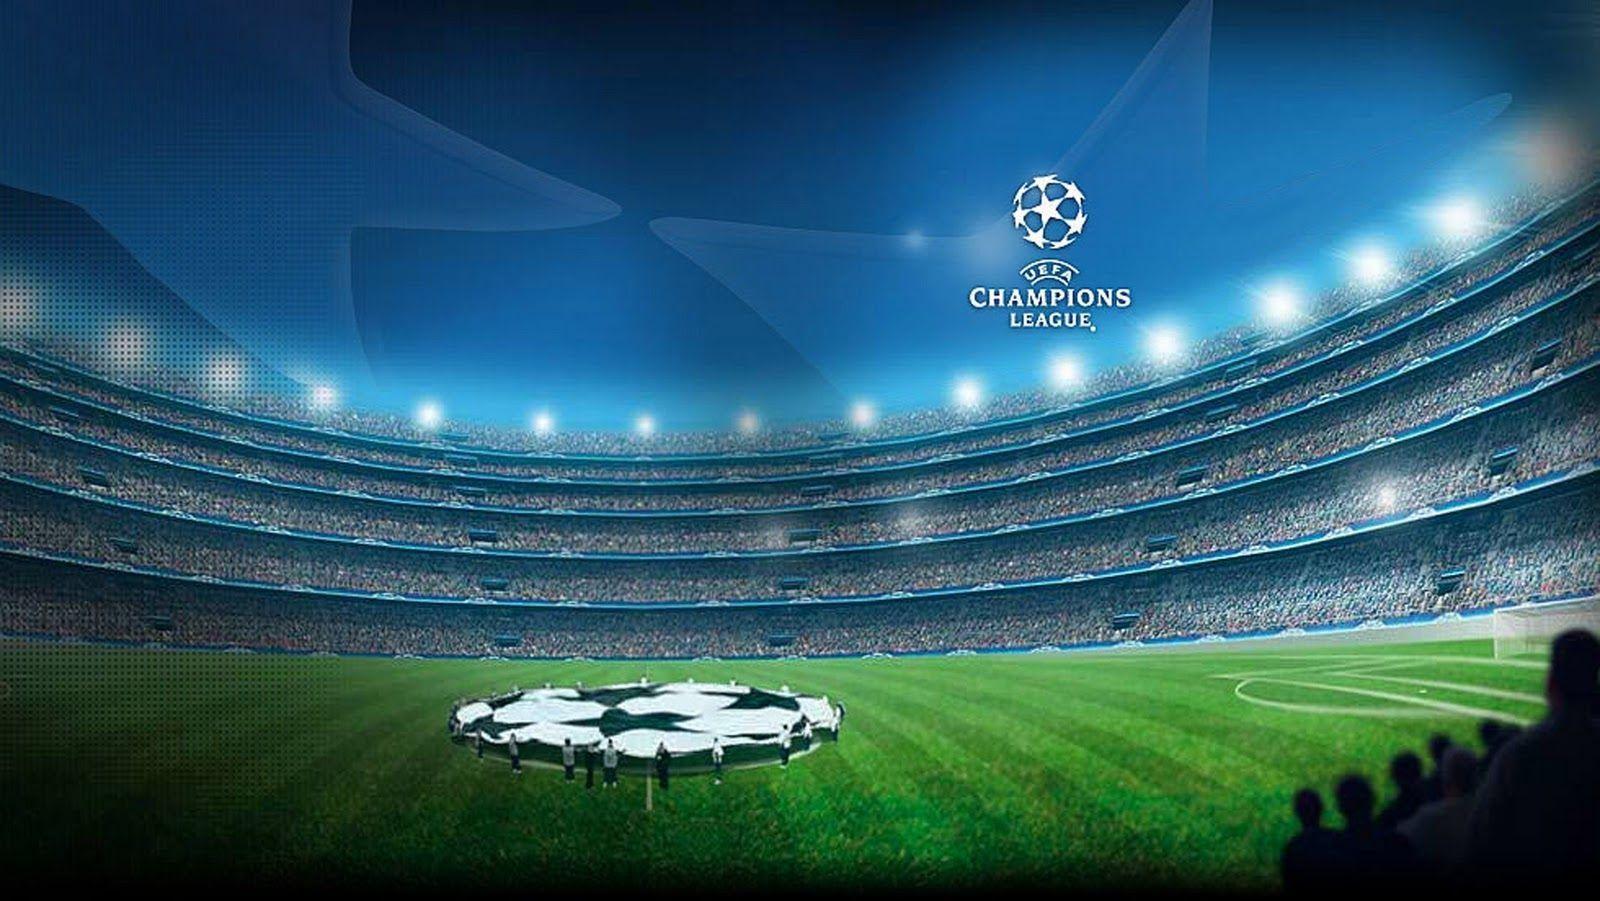 Uefa Champions League Wallpapers Wallpaper Cave